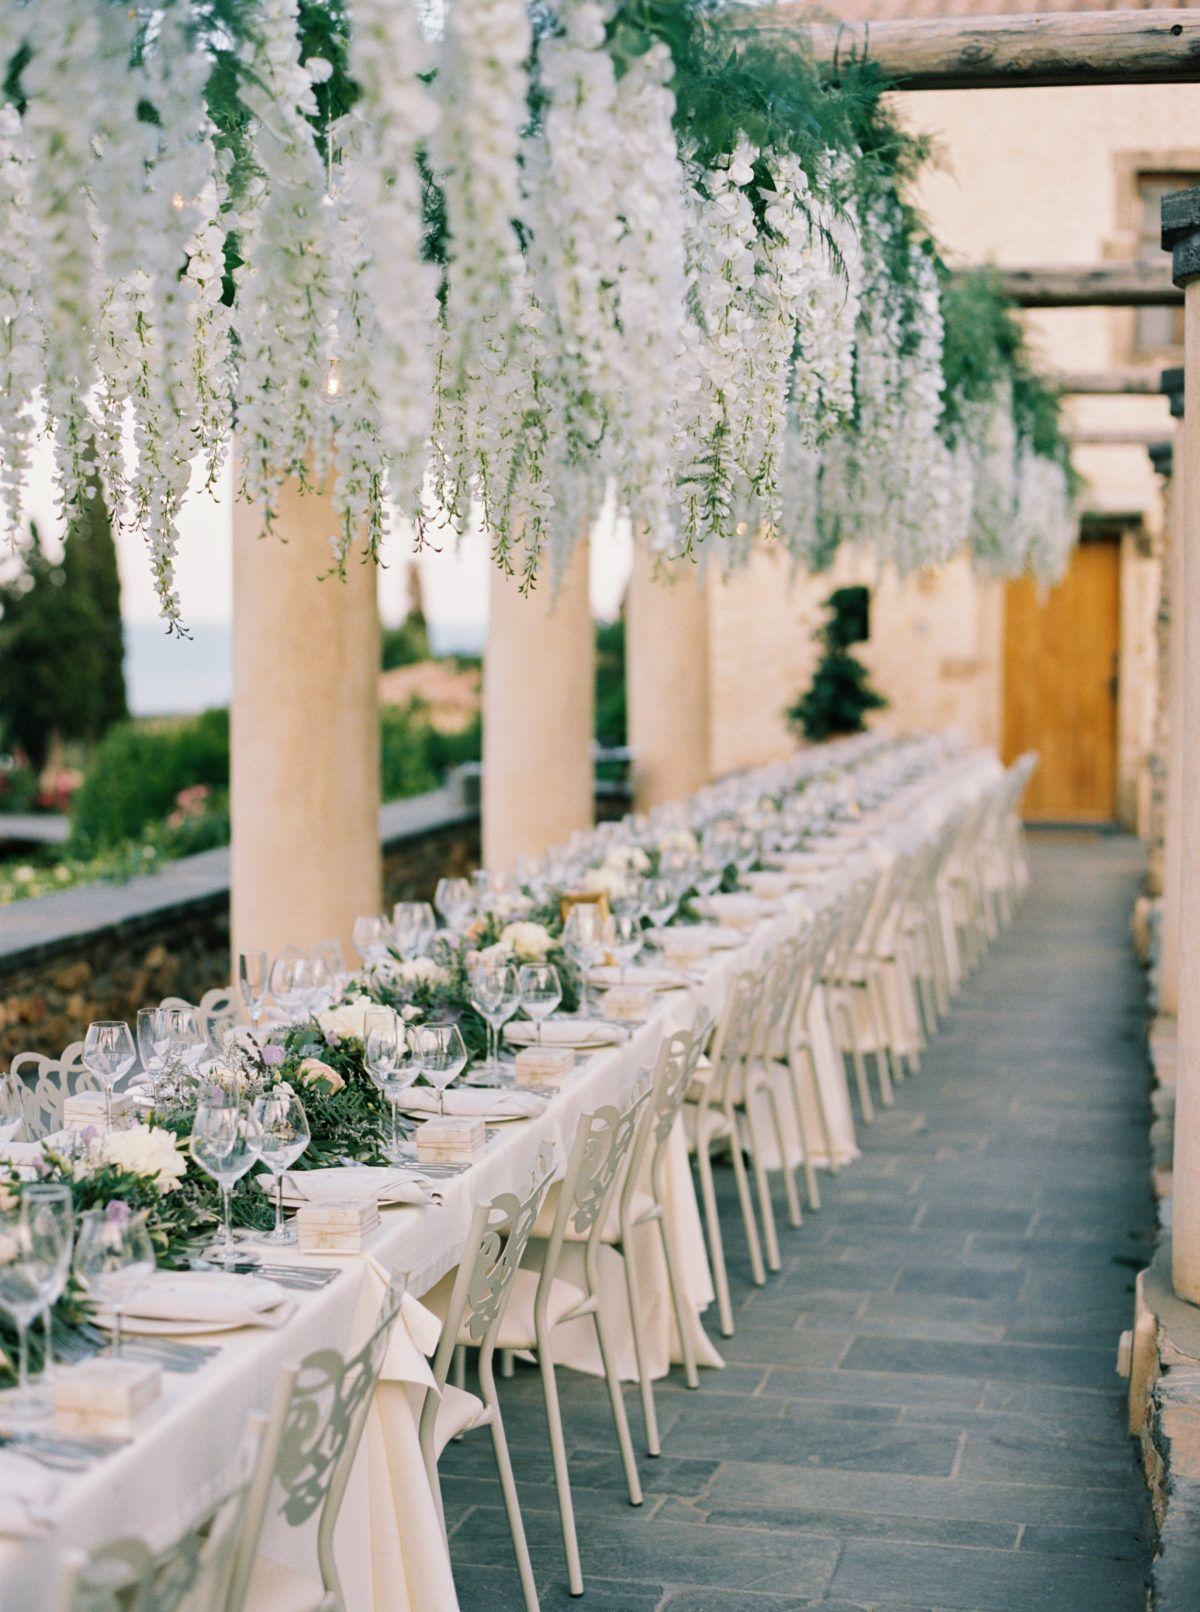 Mamma Mia The Most Gorgeous Kinsterna Hotel Wedding In Greece Beach Wedding Flowers Greek Wedding Greece Wedding